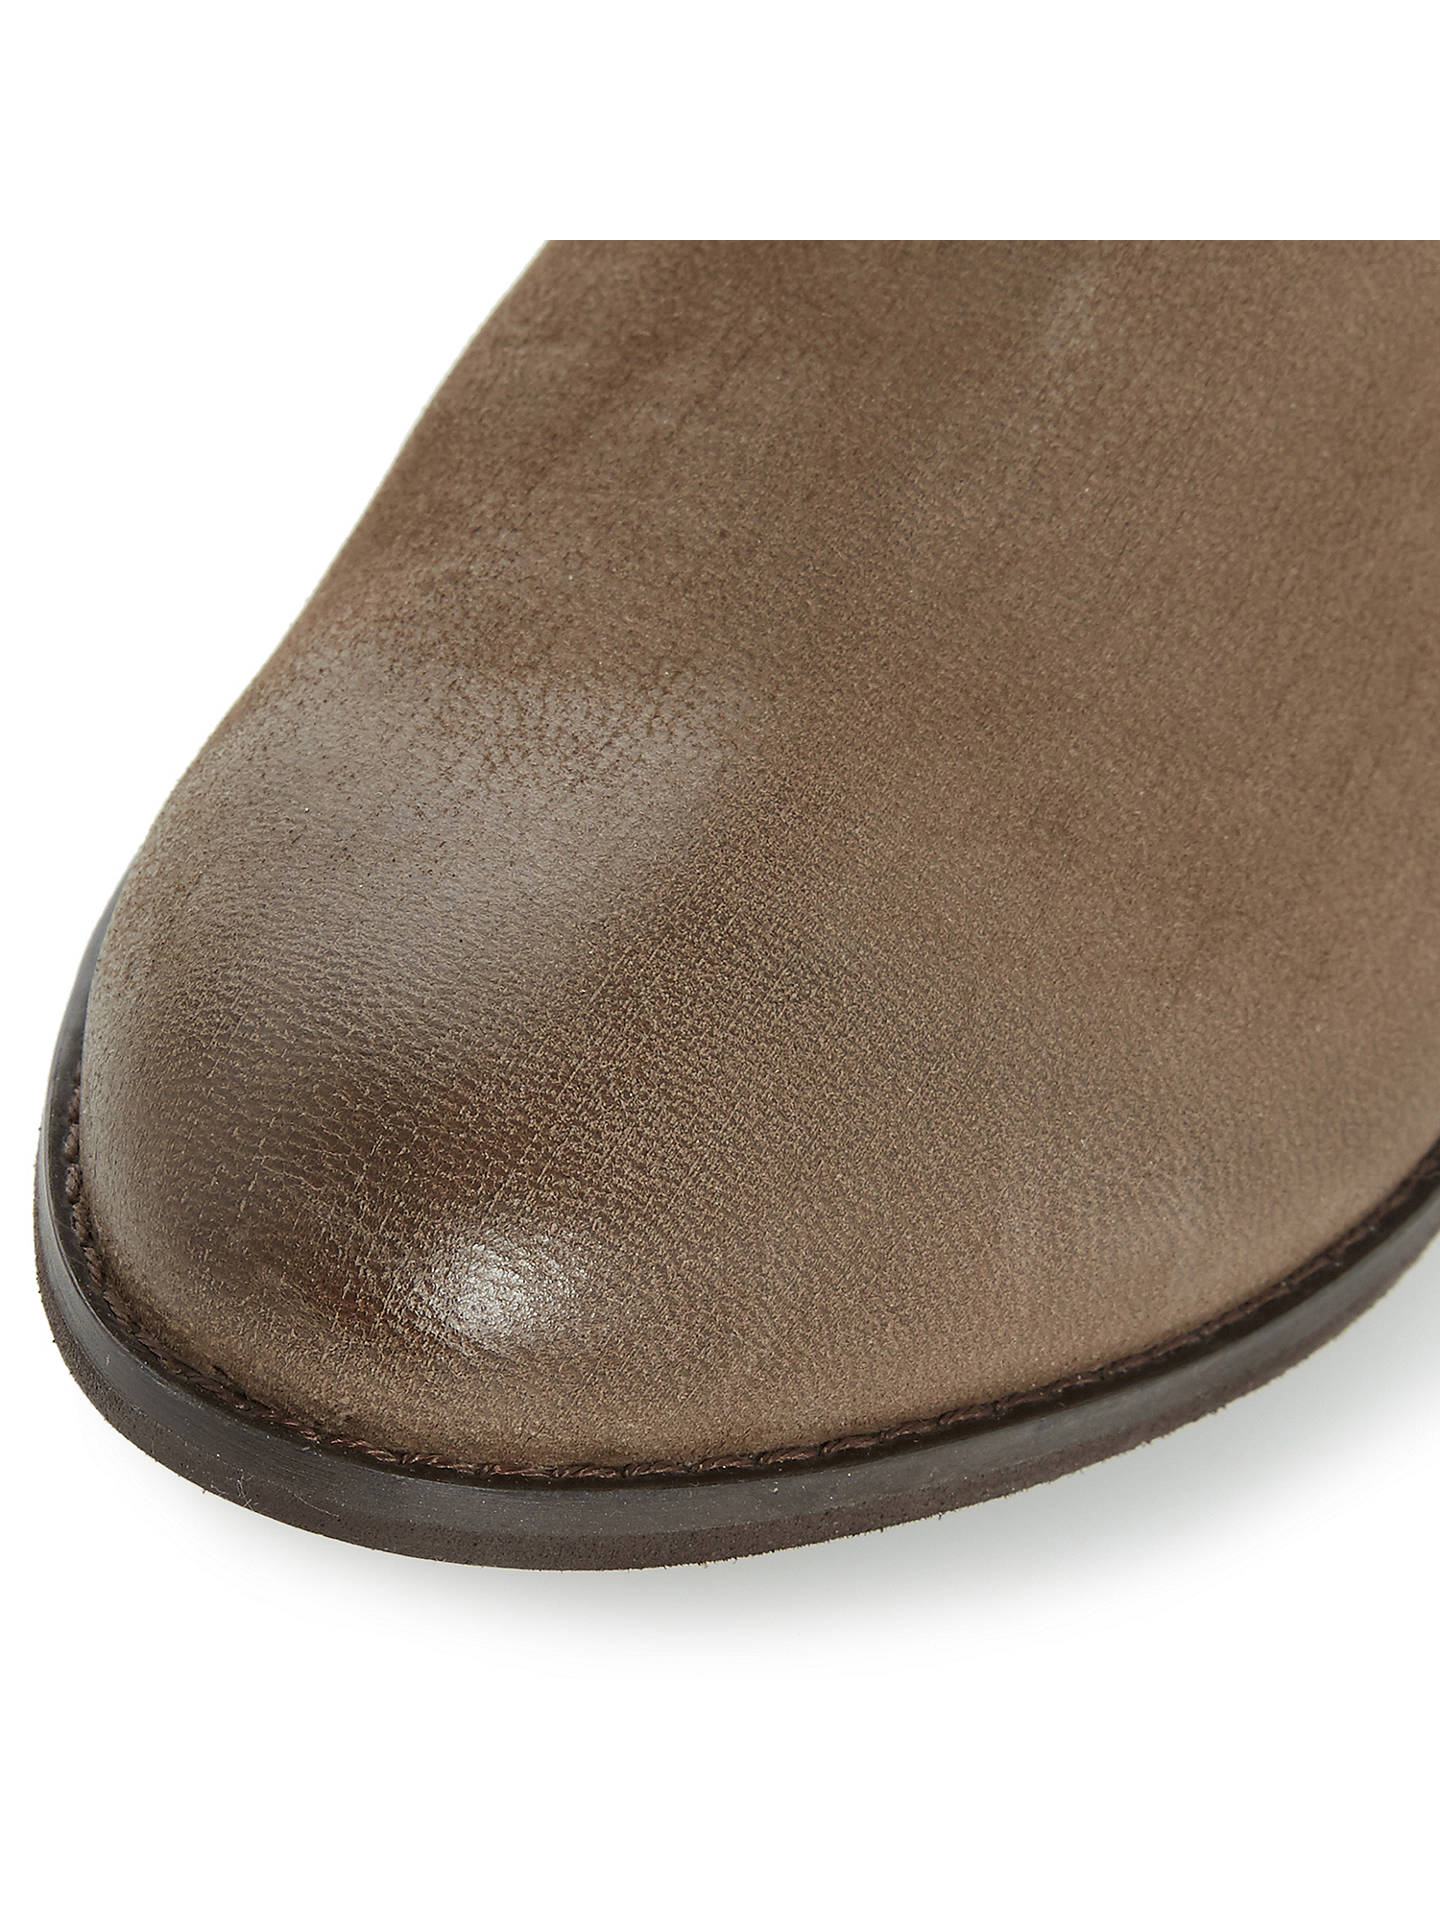 3f807a6d5bd Dune Rosalind Ruched Calf Boots at John Lewis & Partners